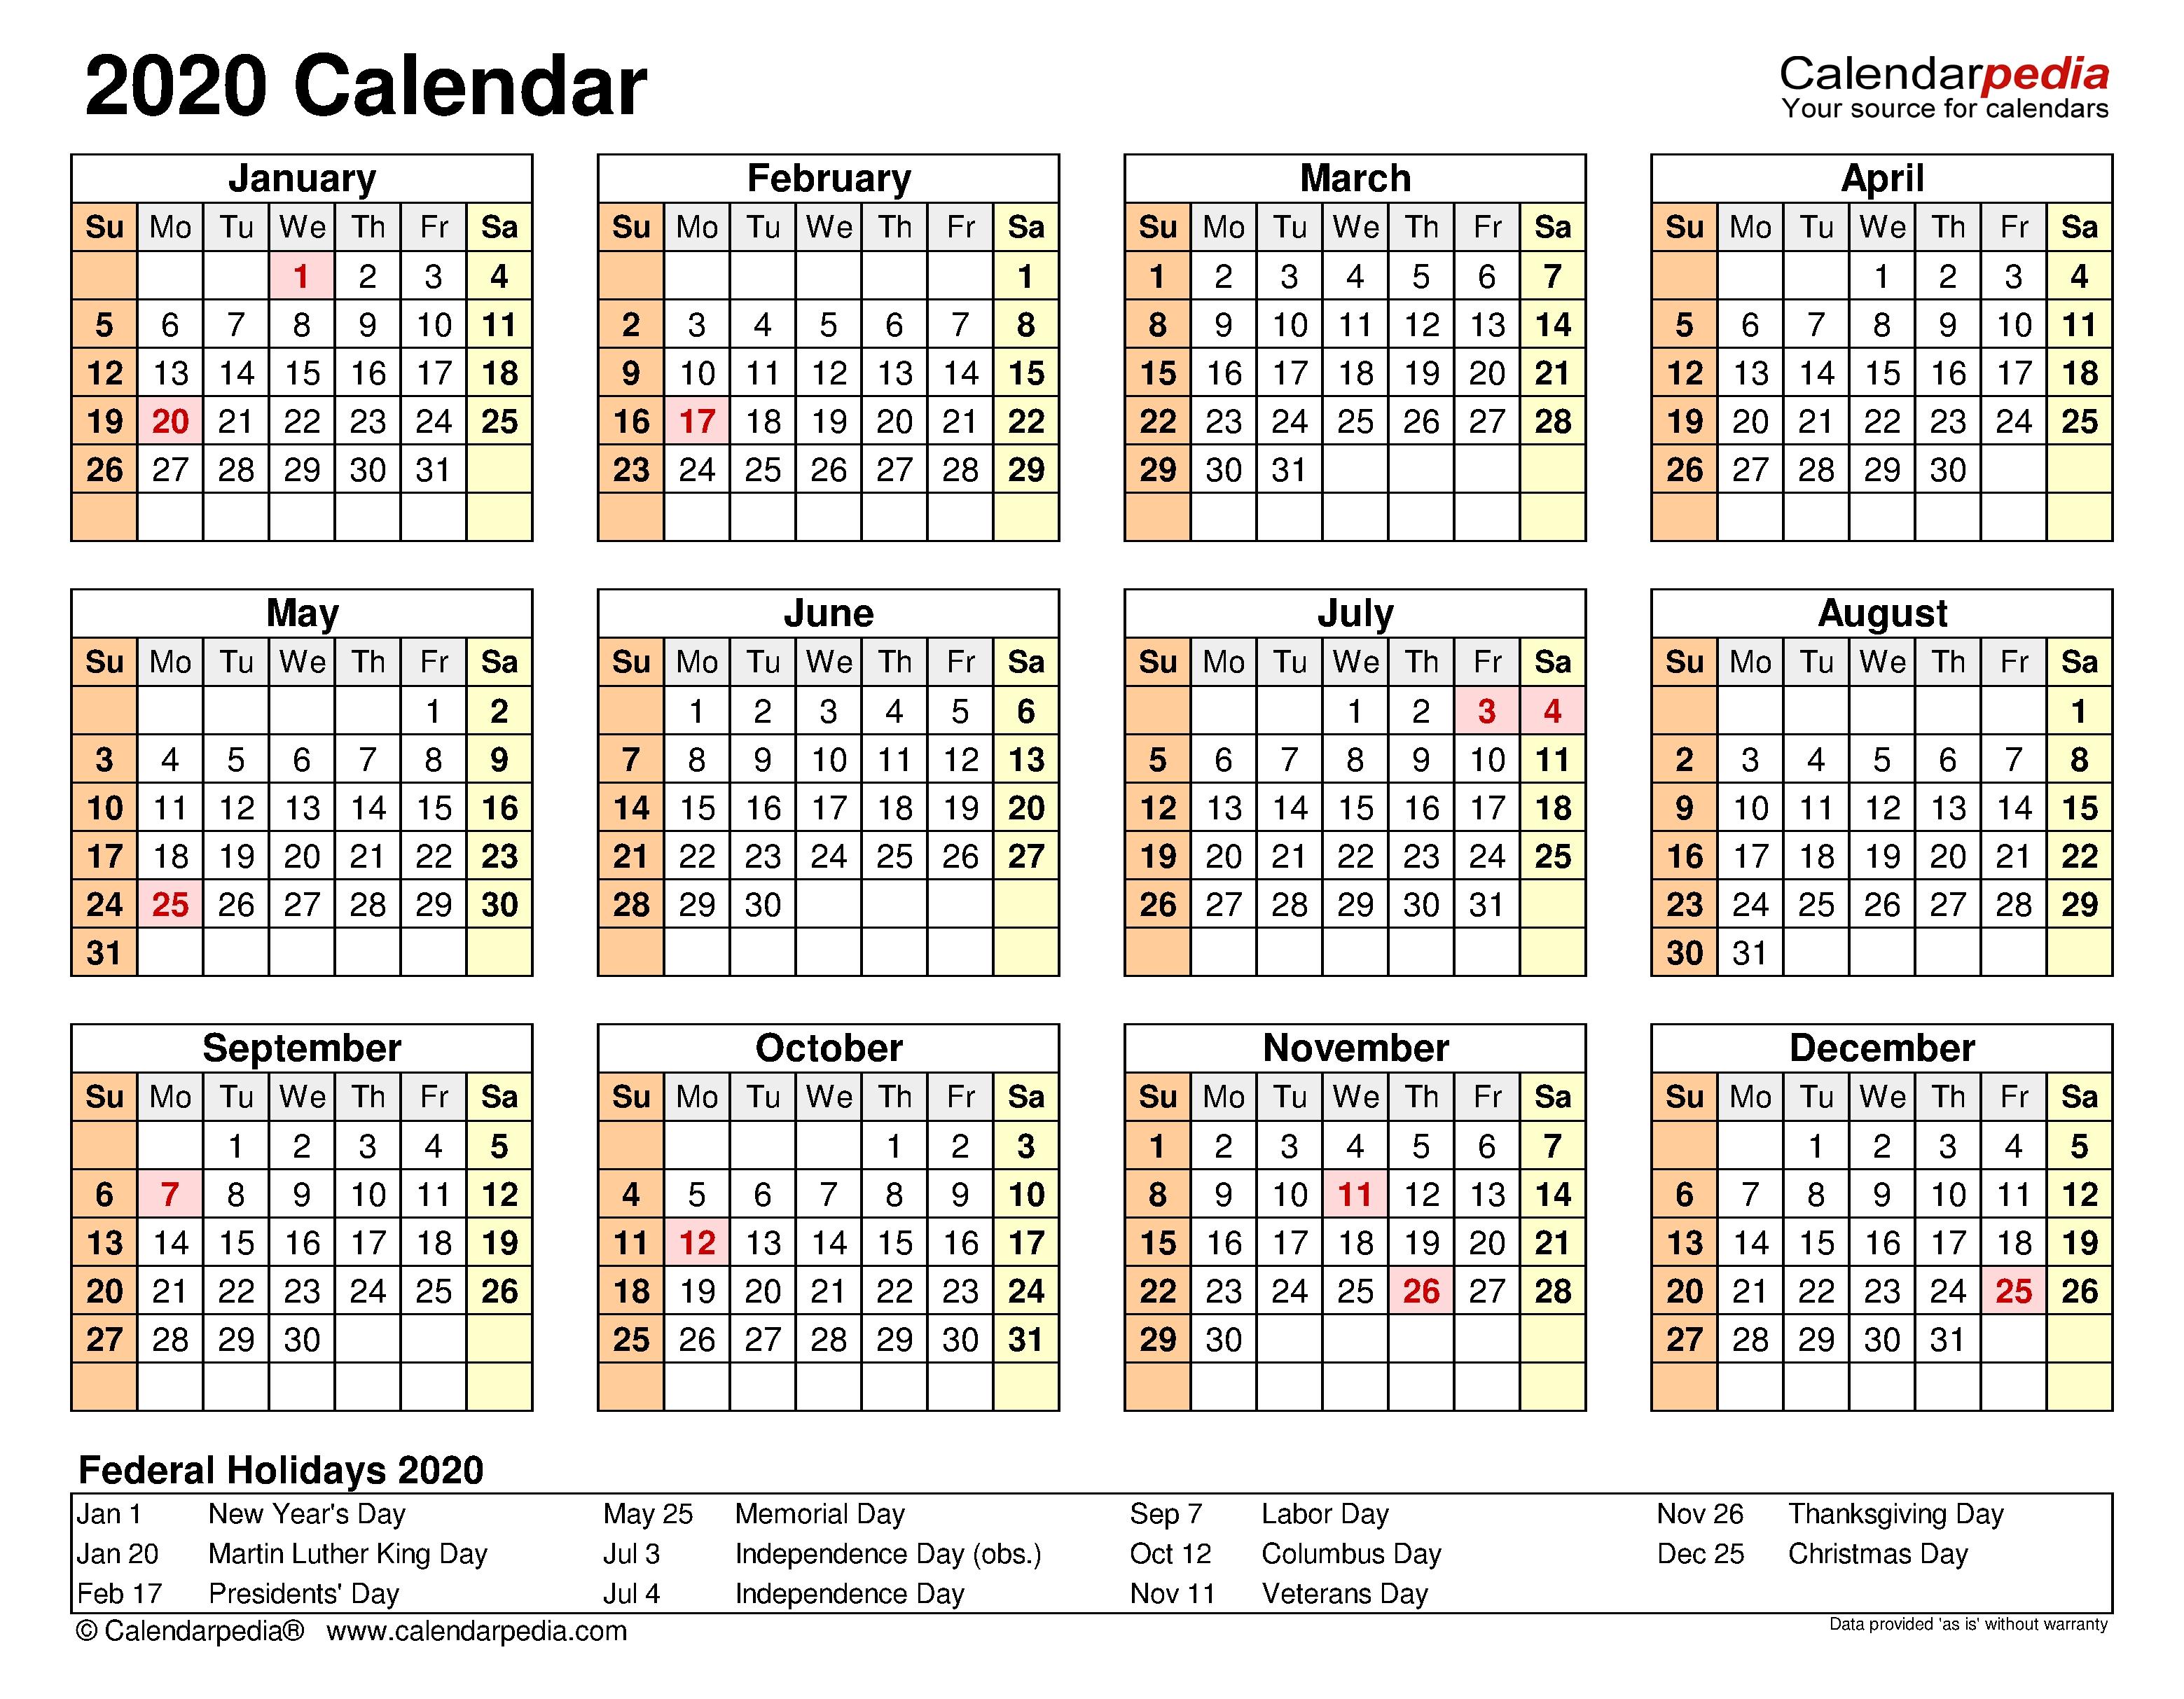 2020 Calendar - Free Printable Microsoft Excel Templates